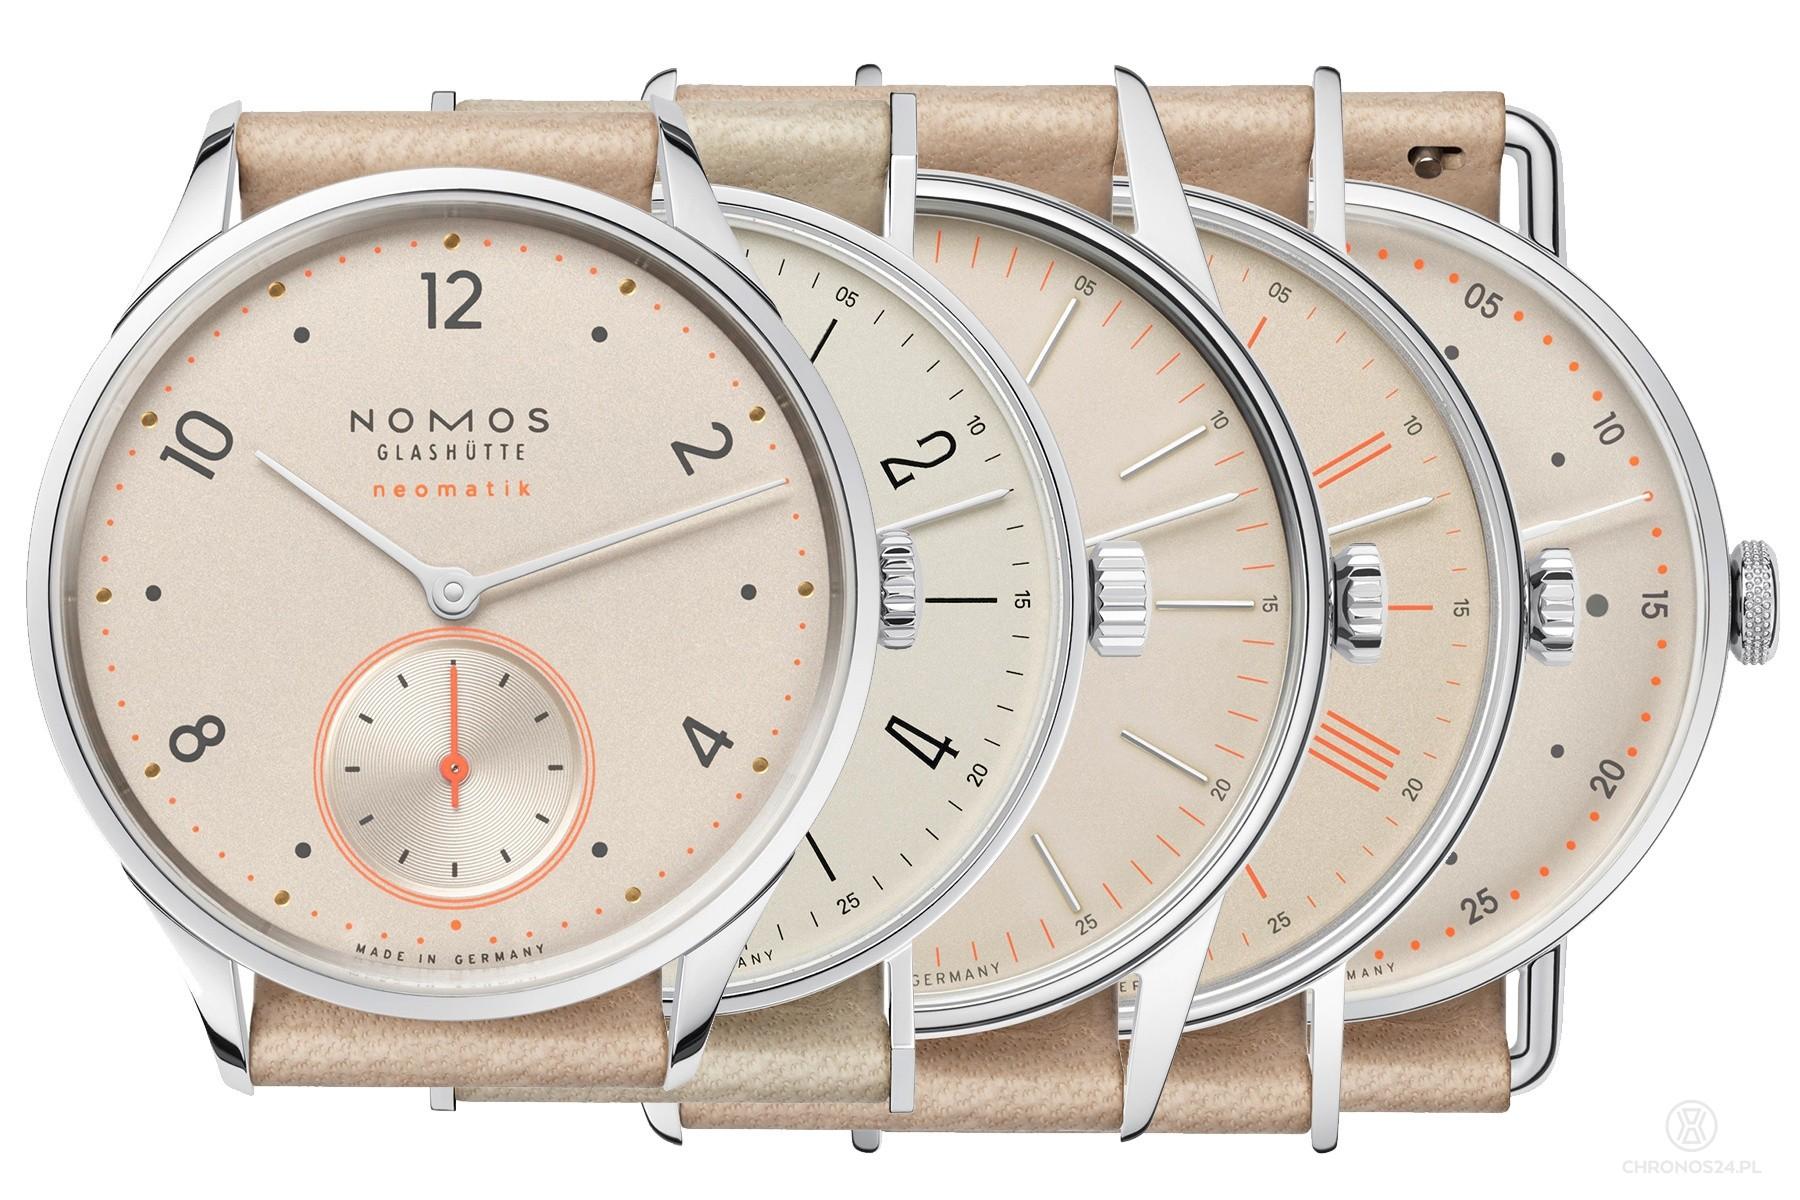 NOMOS Glashütte Neomatik 1st Edition